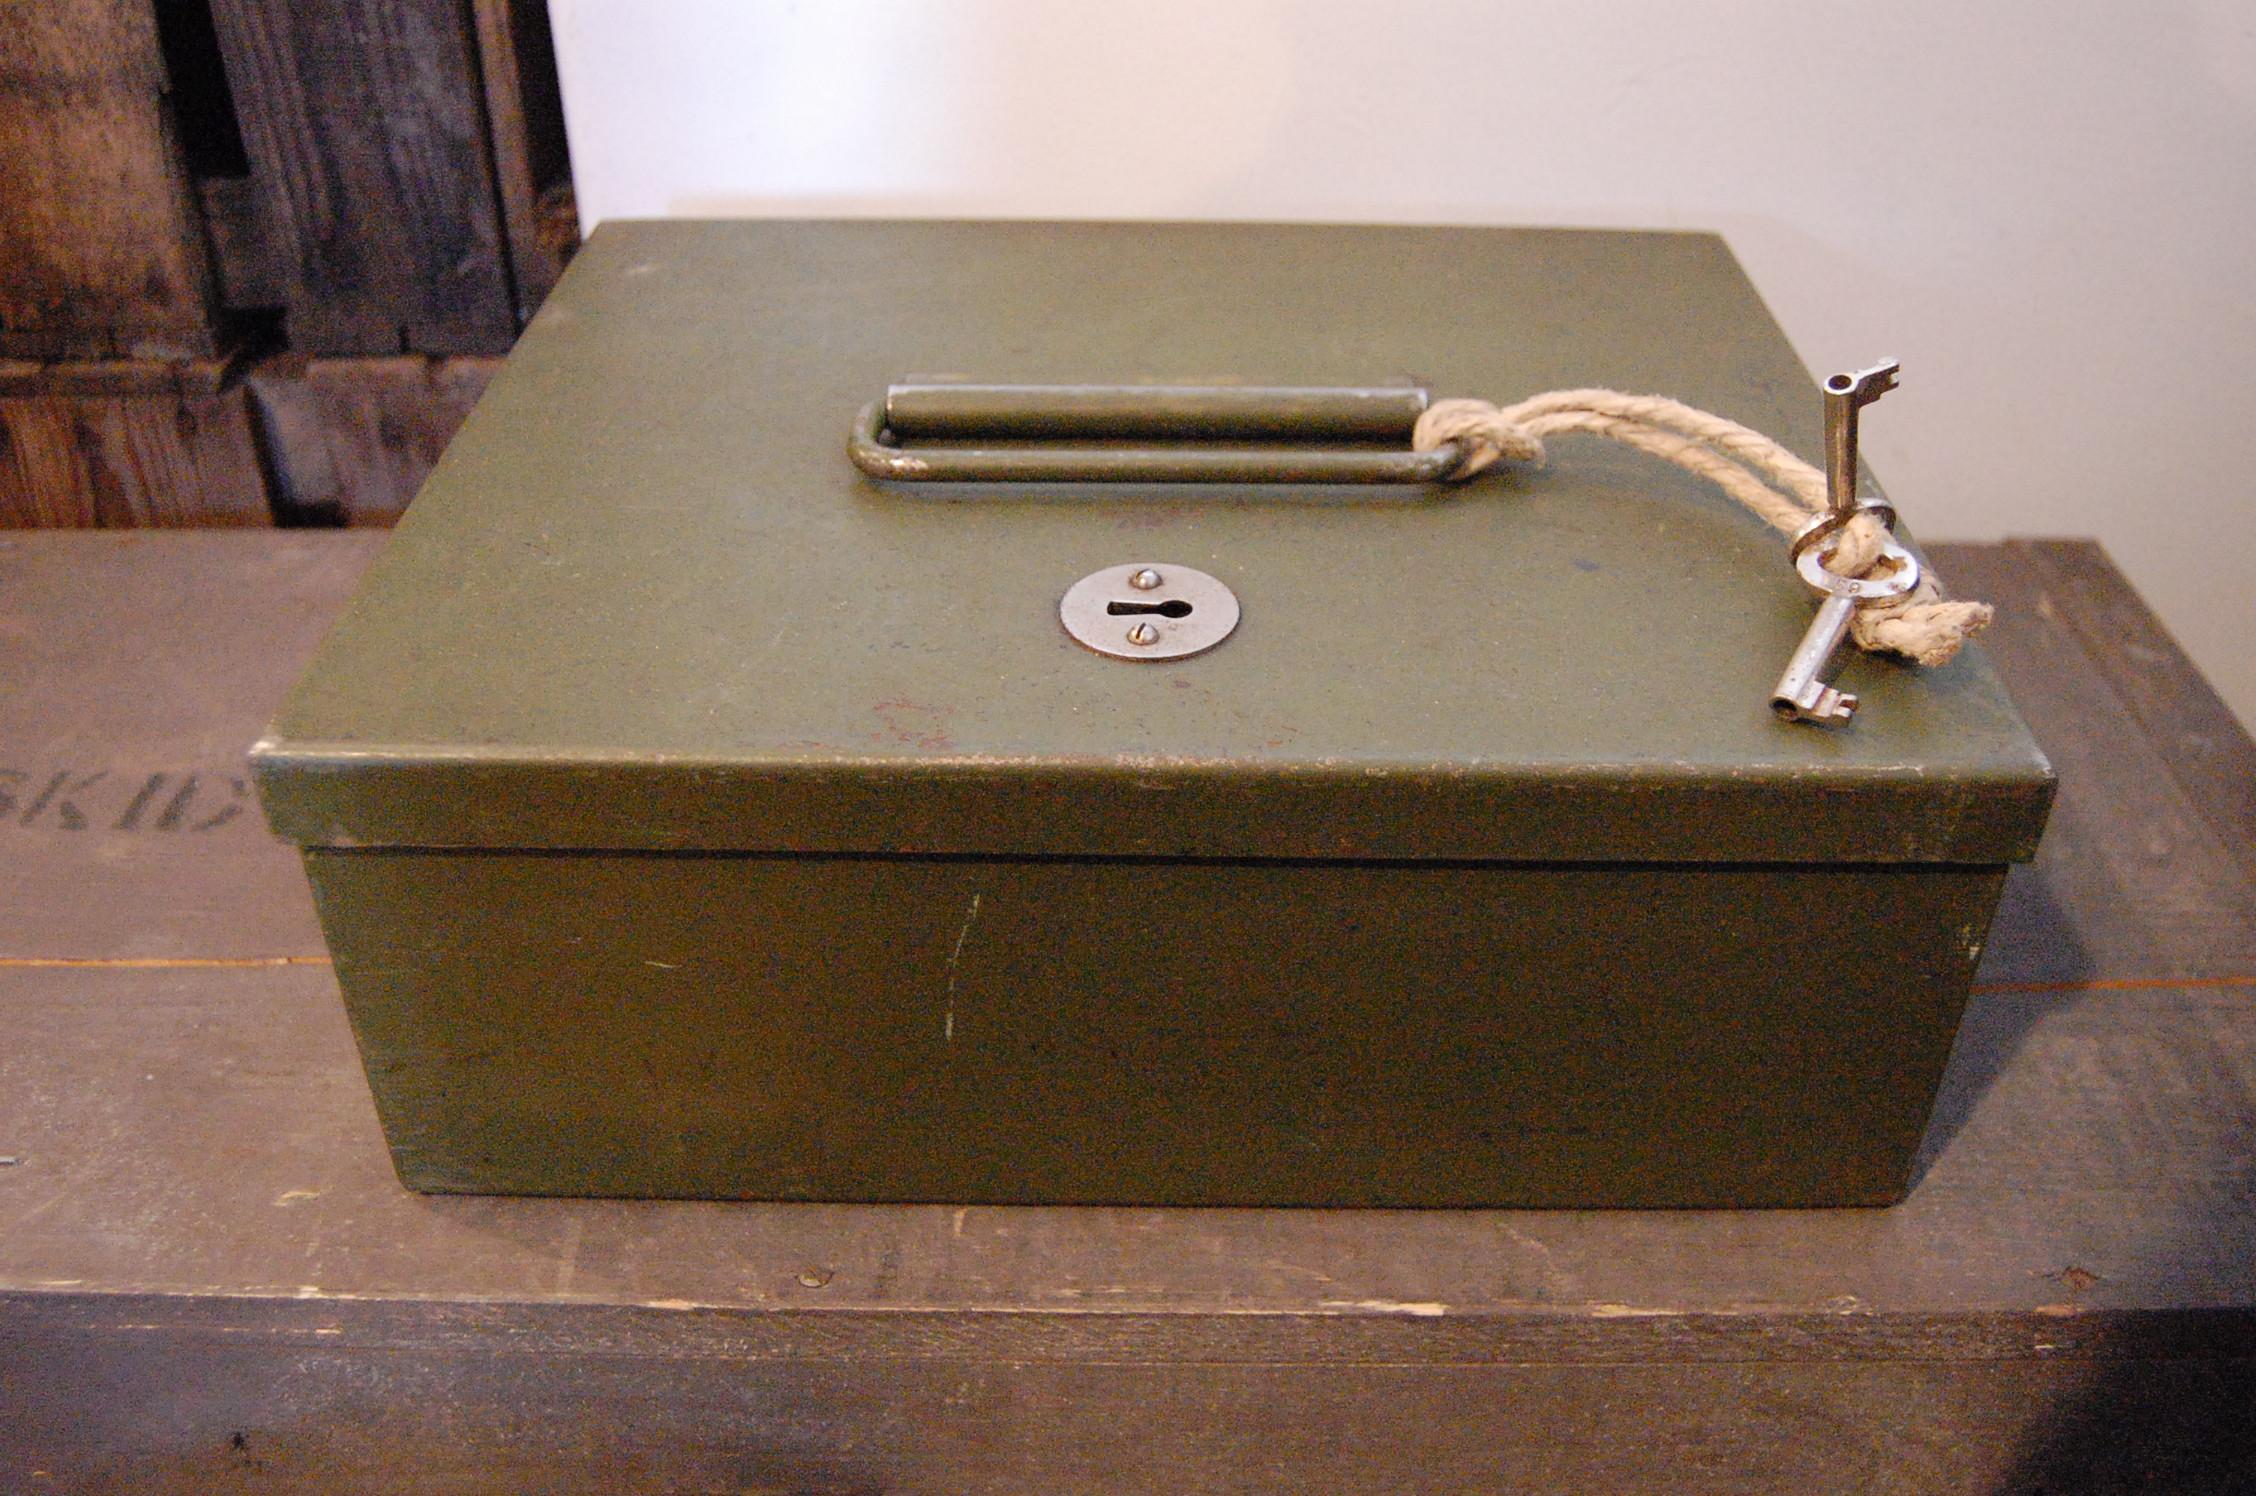 zz0130l スウェーデン 古い鍵付き金庫